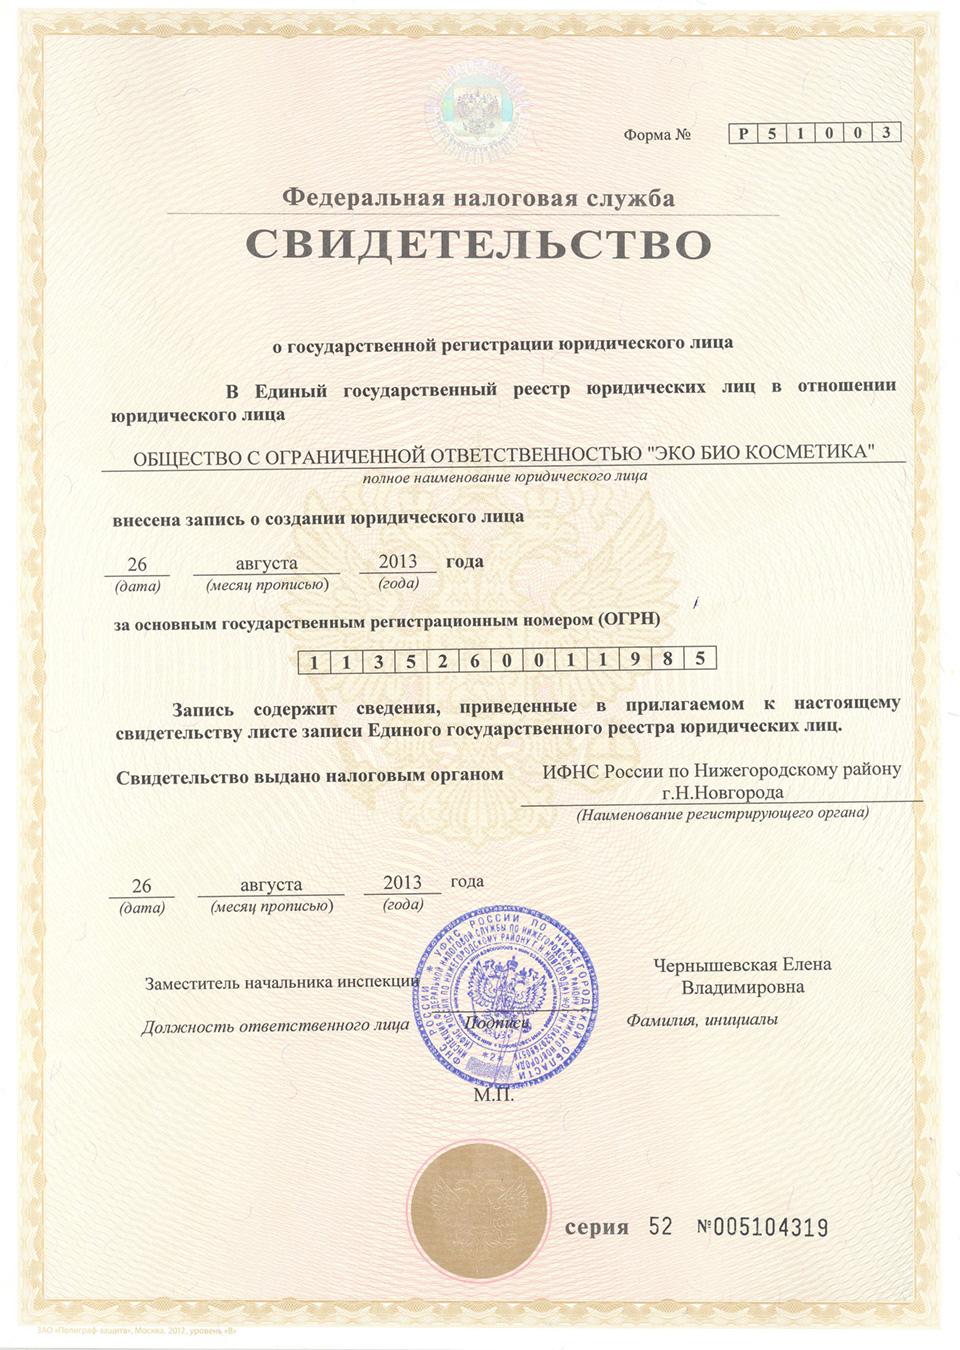 Свидетельство о регистрации ООО «Эко Био Косметика» ОГРН